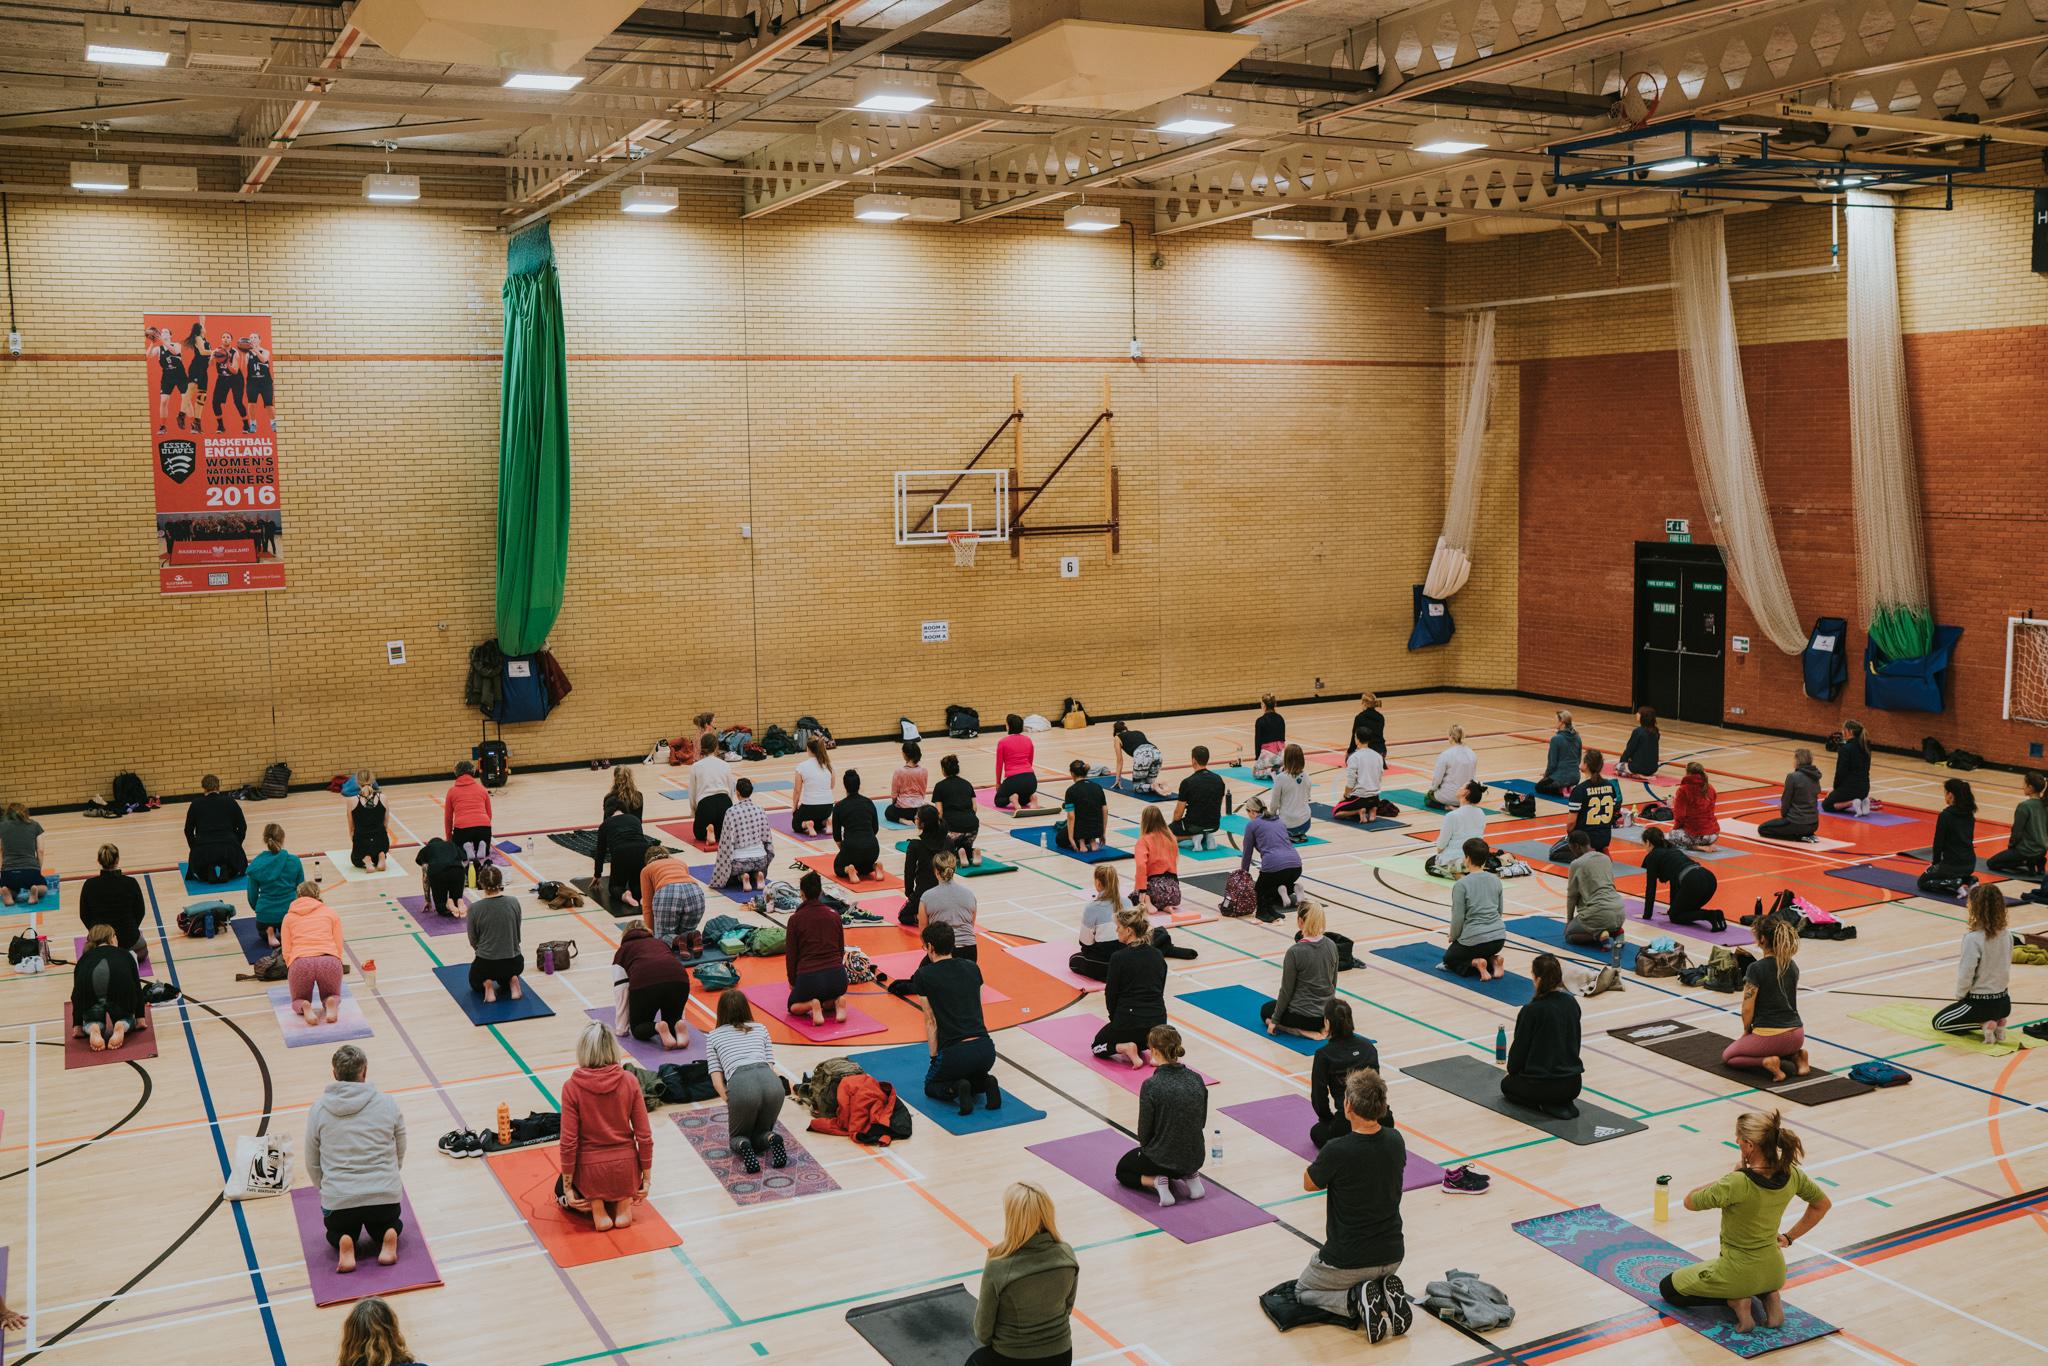 yogific-essex-yoga-vegan-festival-essex-university-grace-elizabeth-colchester-essex-alternative-wedding-lifestyle-photographer-suffolk-norfolk-devon-london-vegan-nights-cruelty-free (65 of 73).jpg